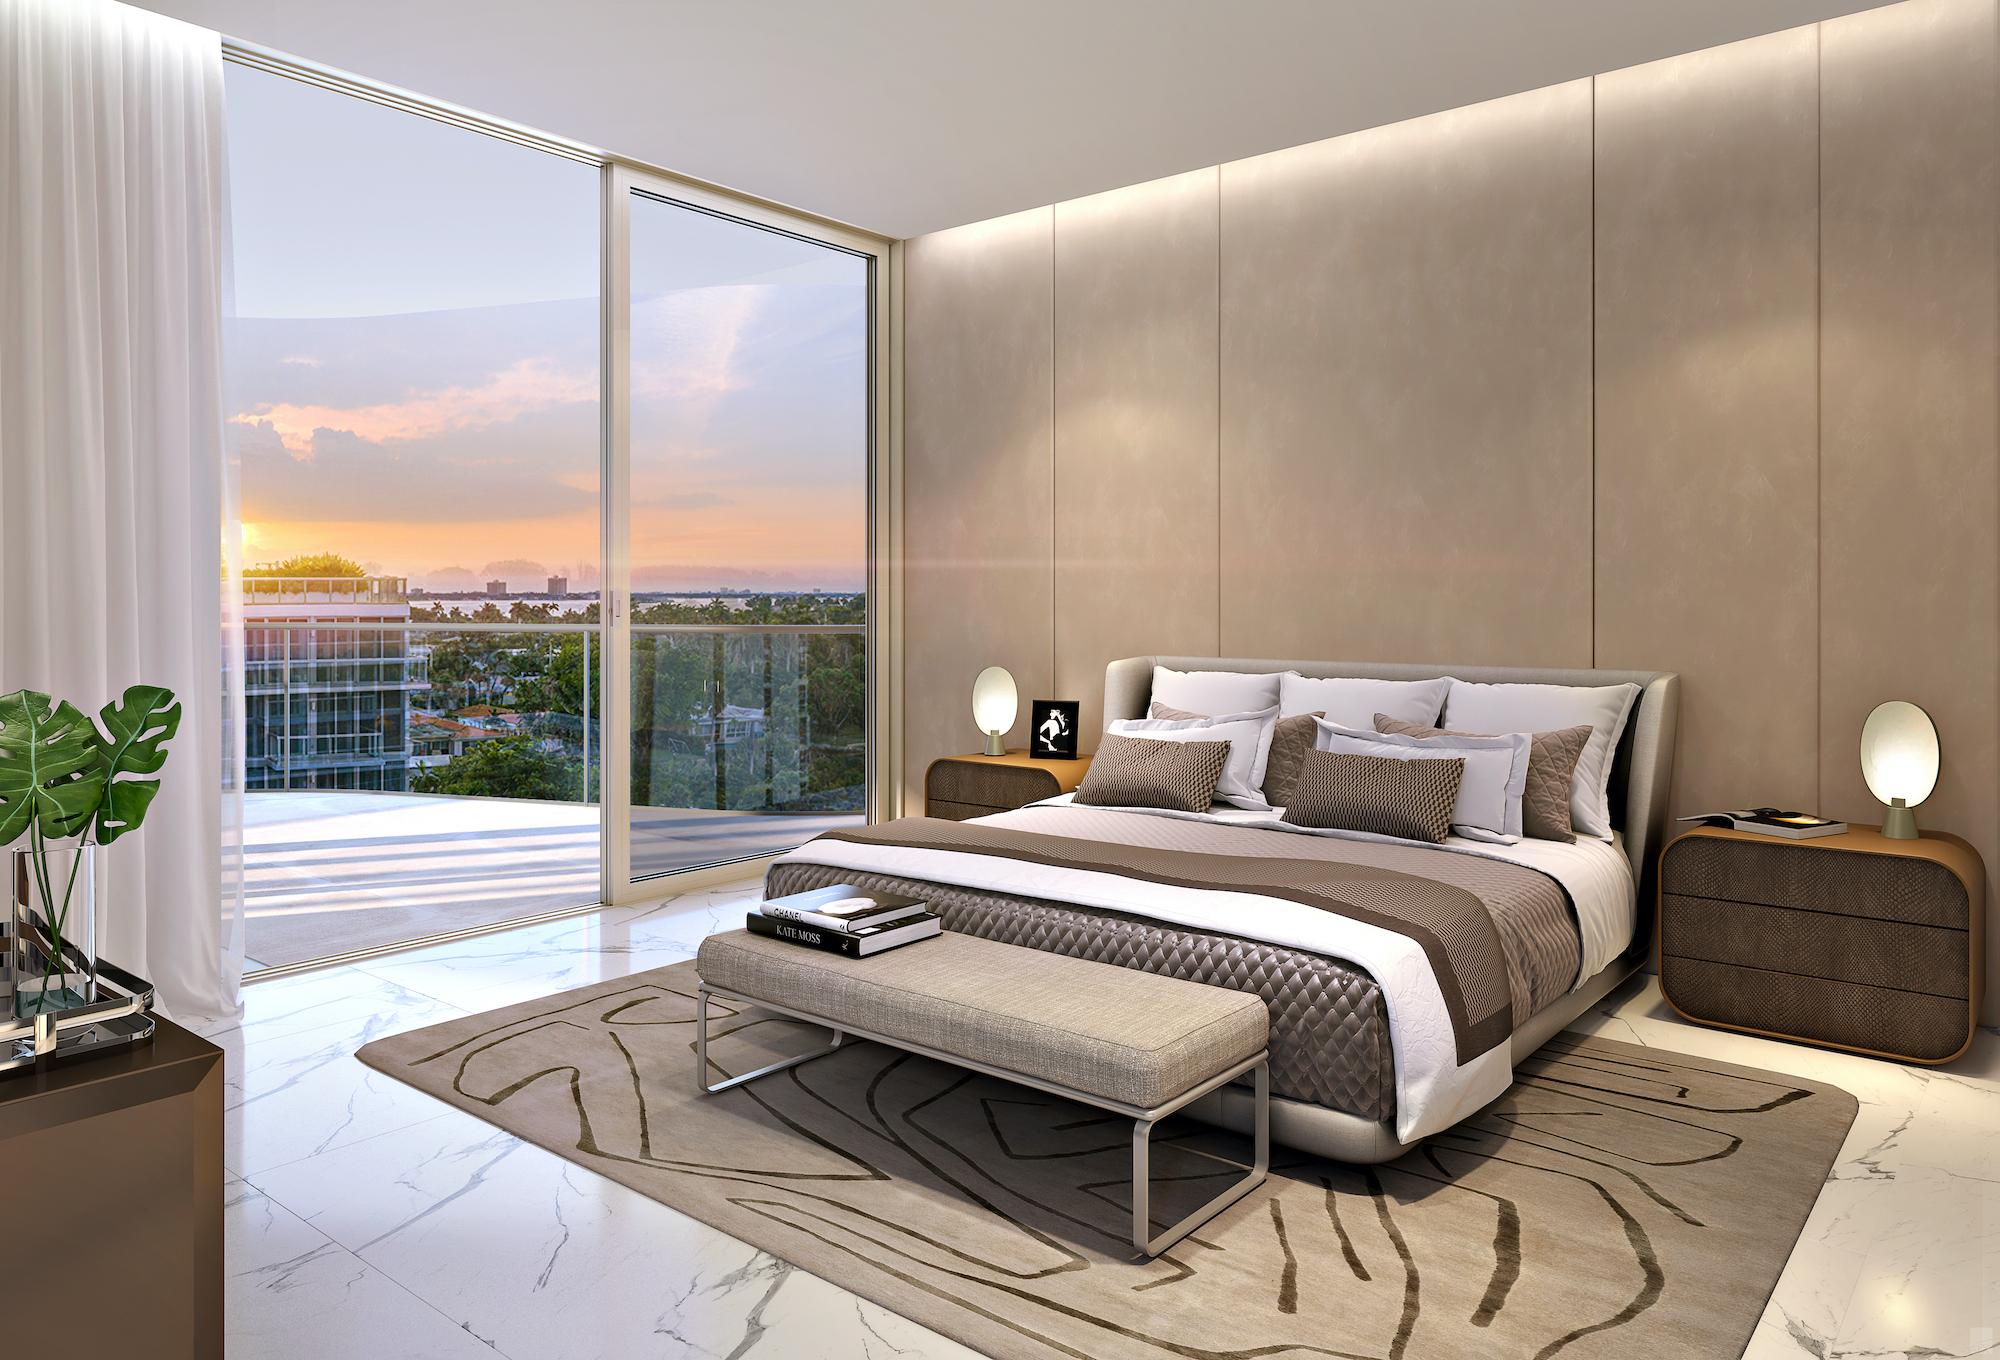 Ambienta Bedroom